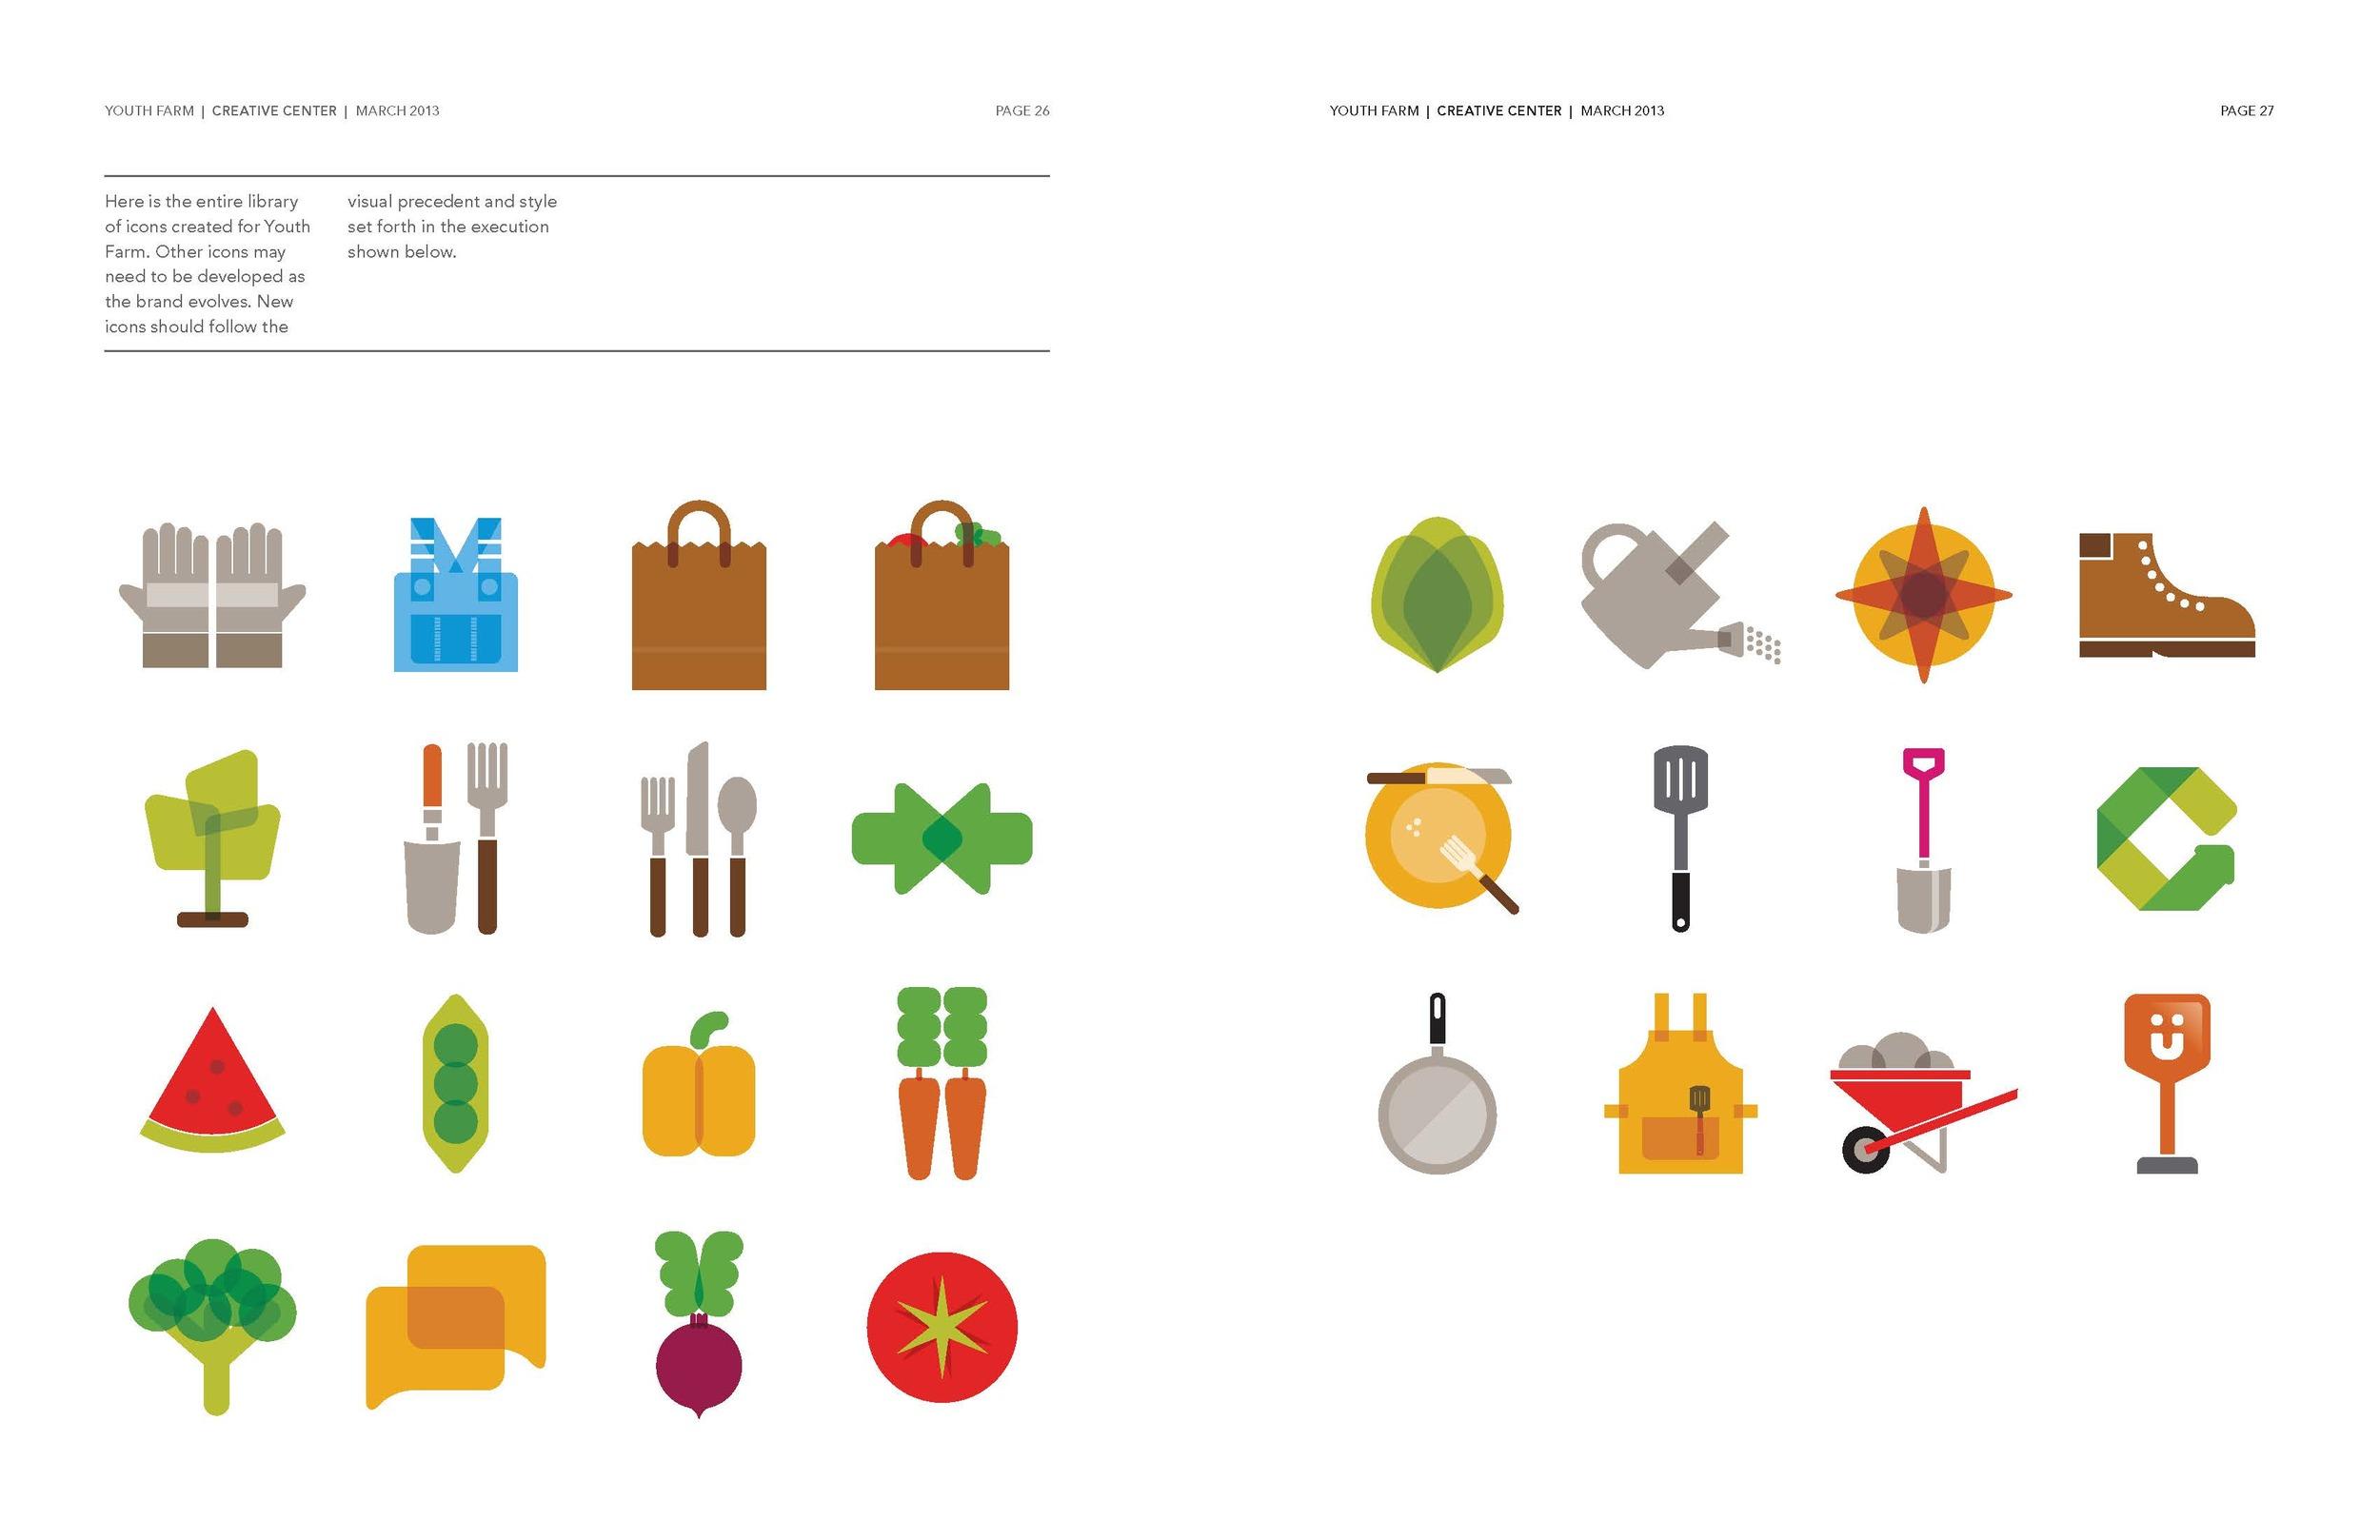 yf_creative_center_Page_14.jpg